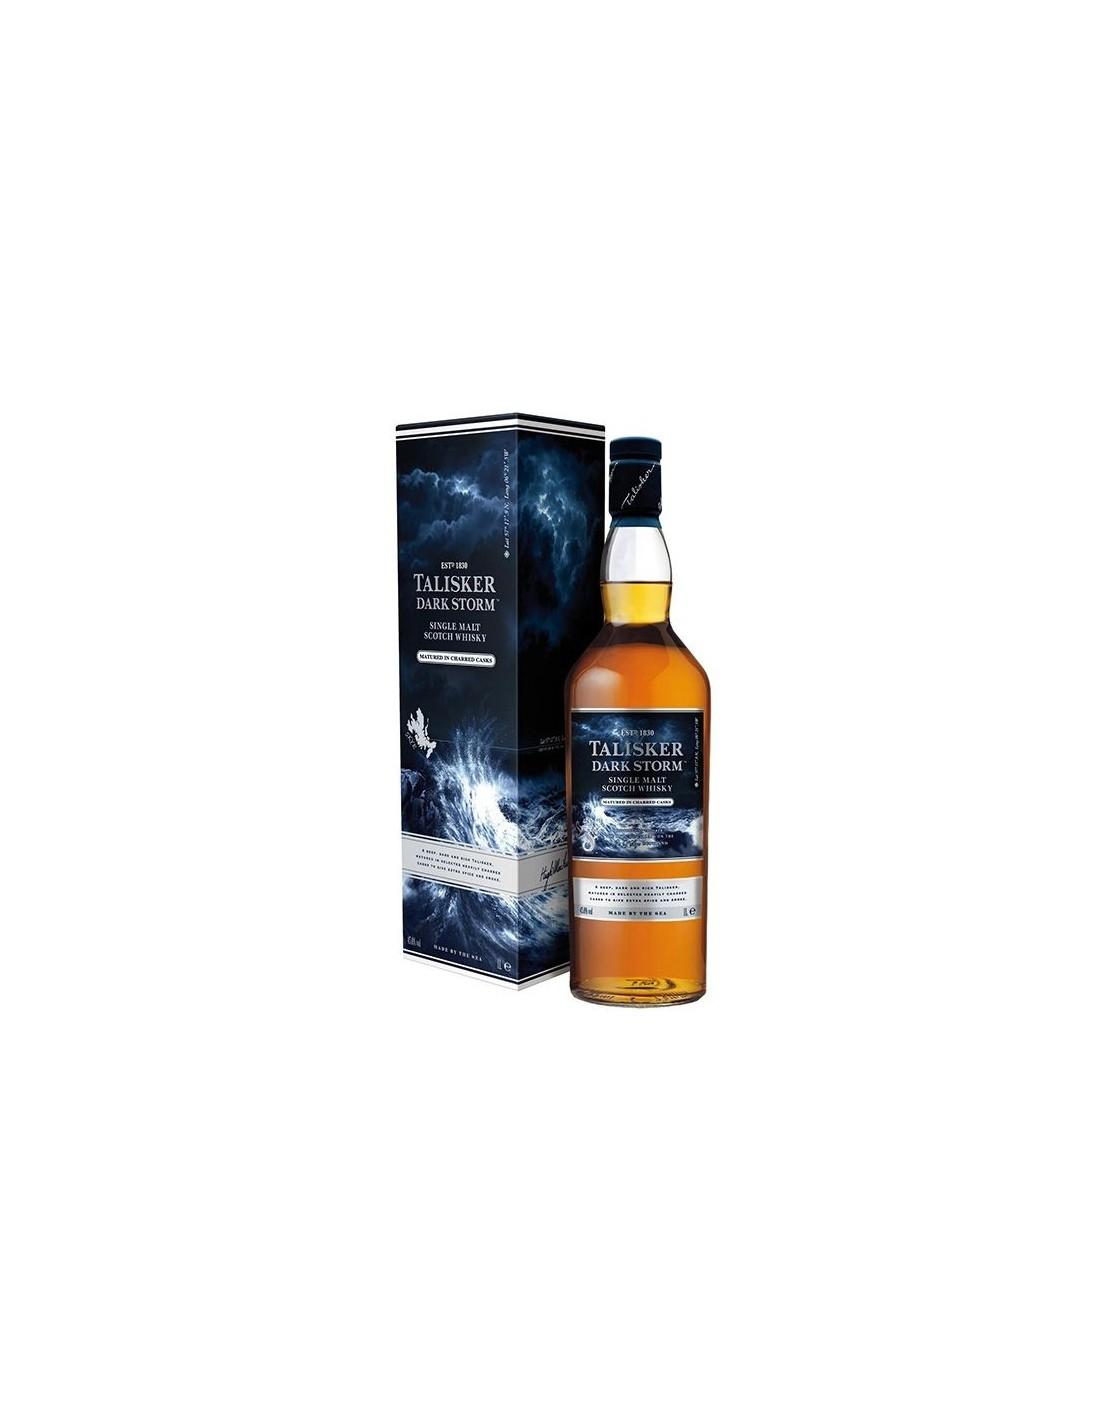 Whisky Talisker Dark Storm, 45.8% alc., 1L, Scotia